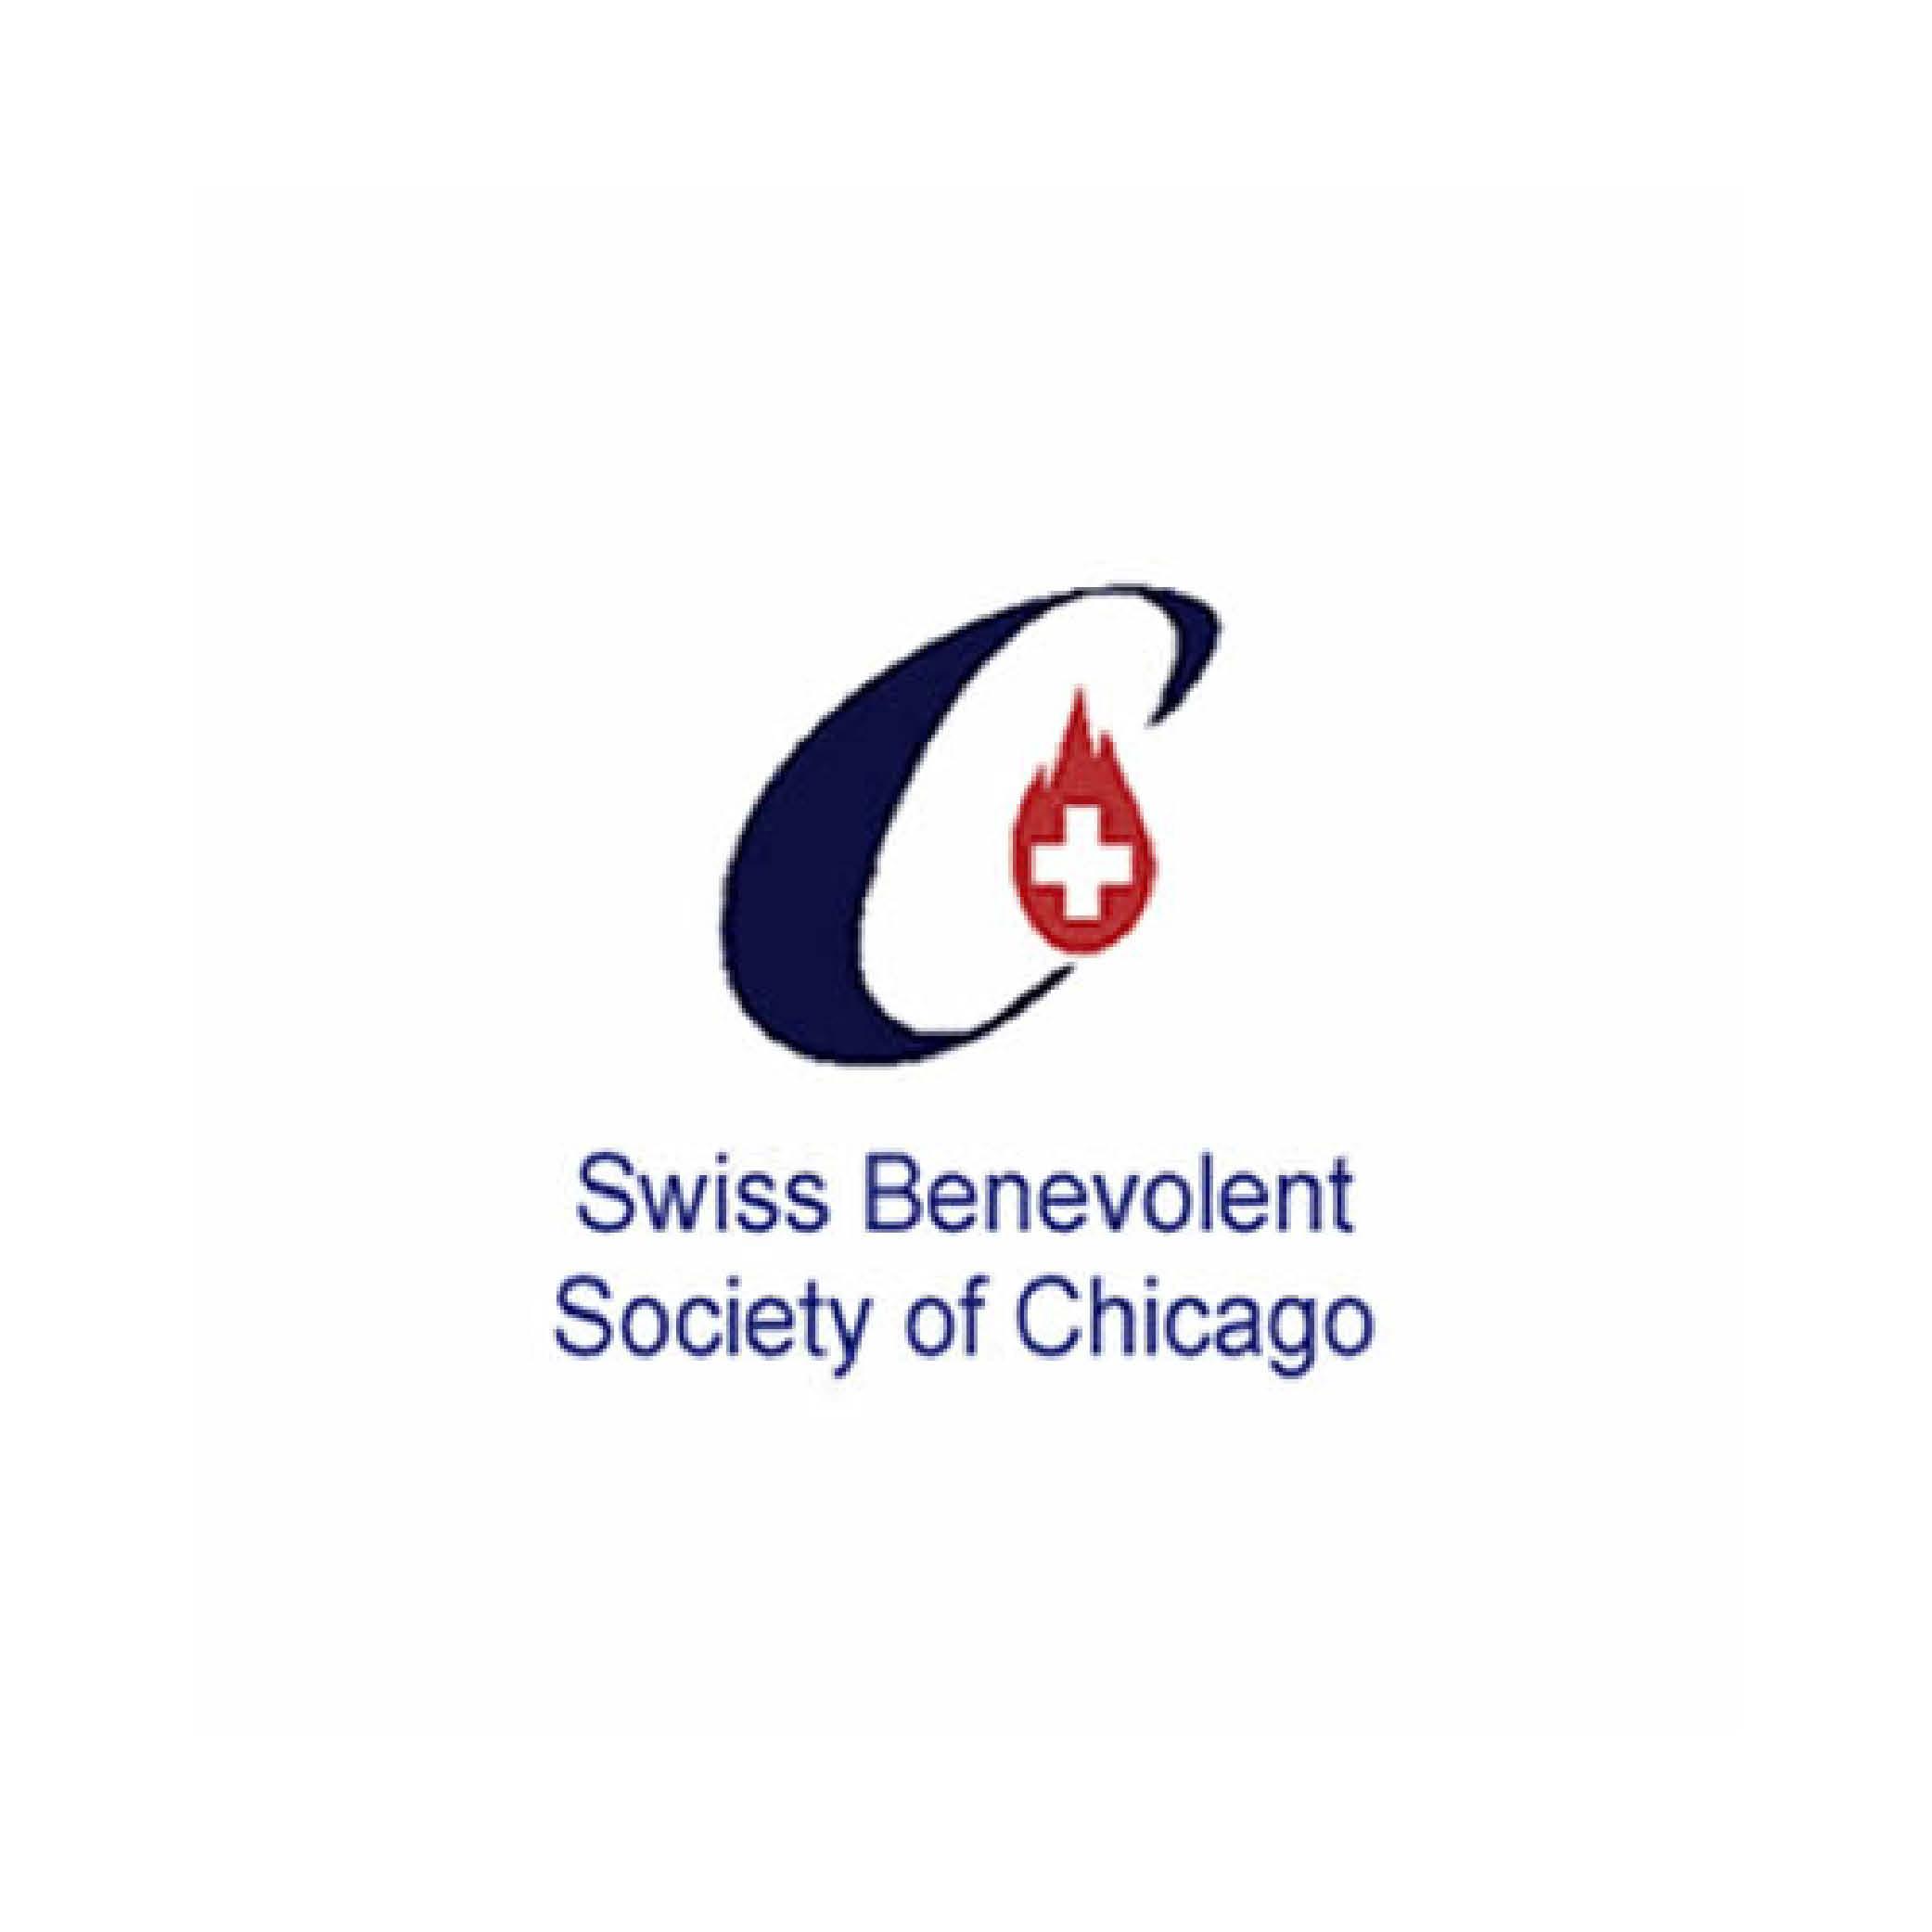 Swiss benevolent logo